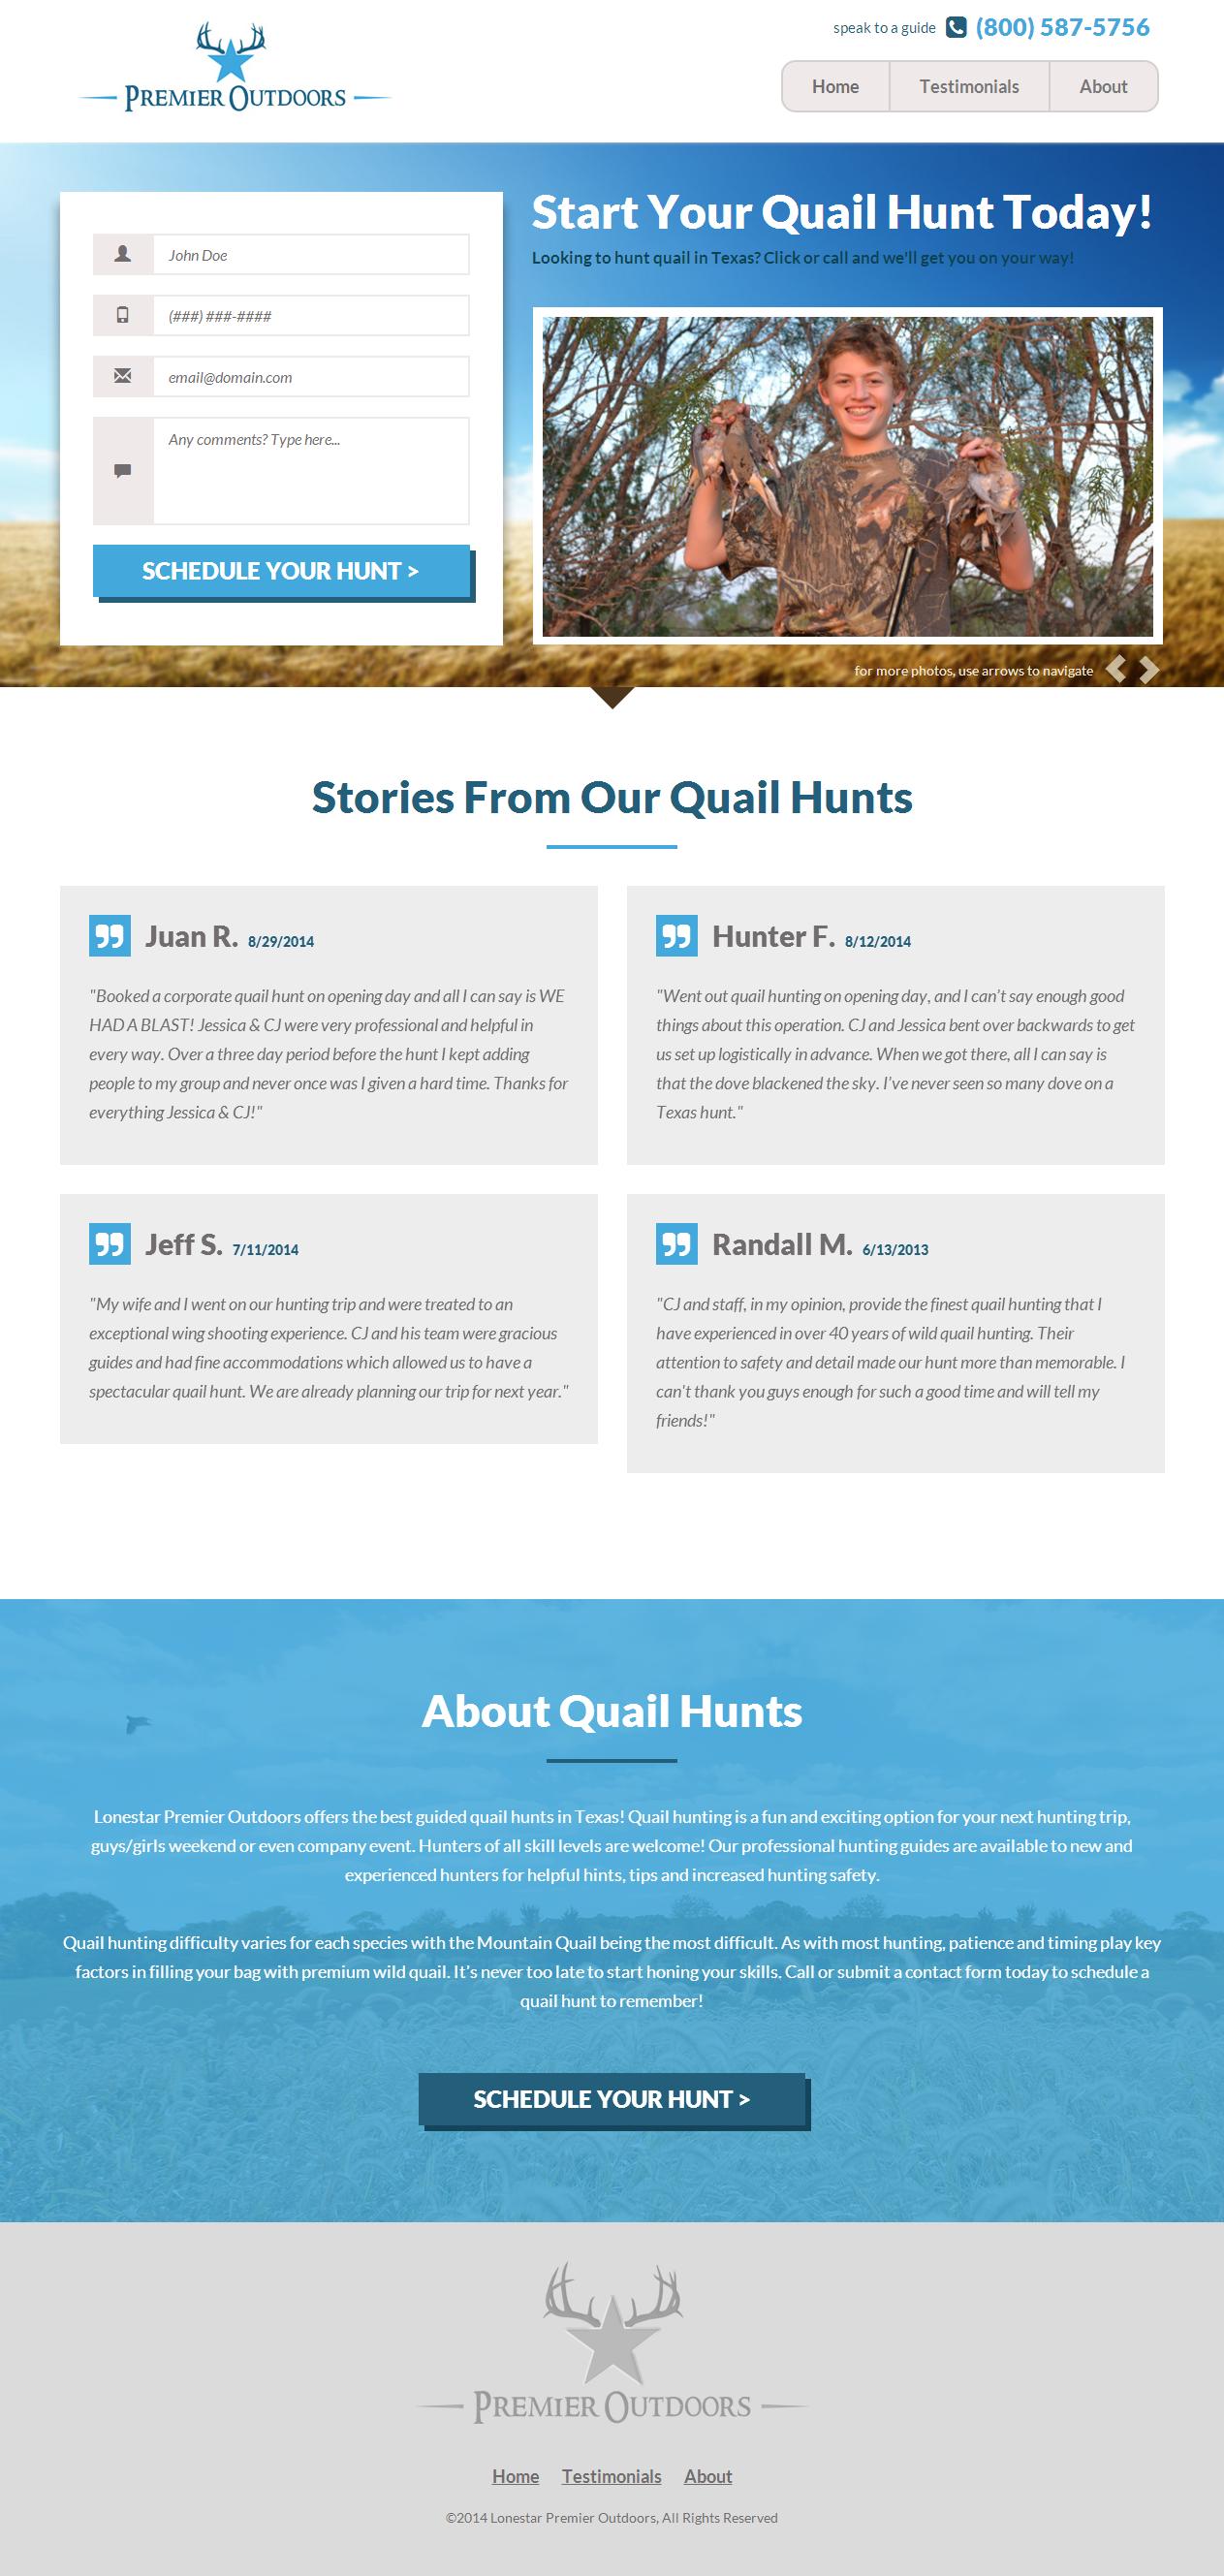 2_Texas Quail Hunts with Lonestar Premier Outdoors